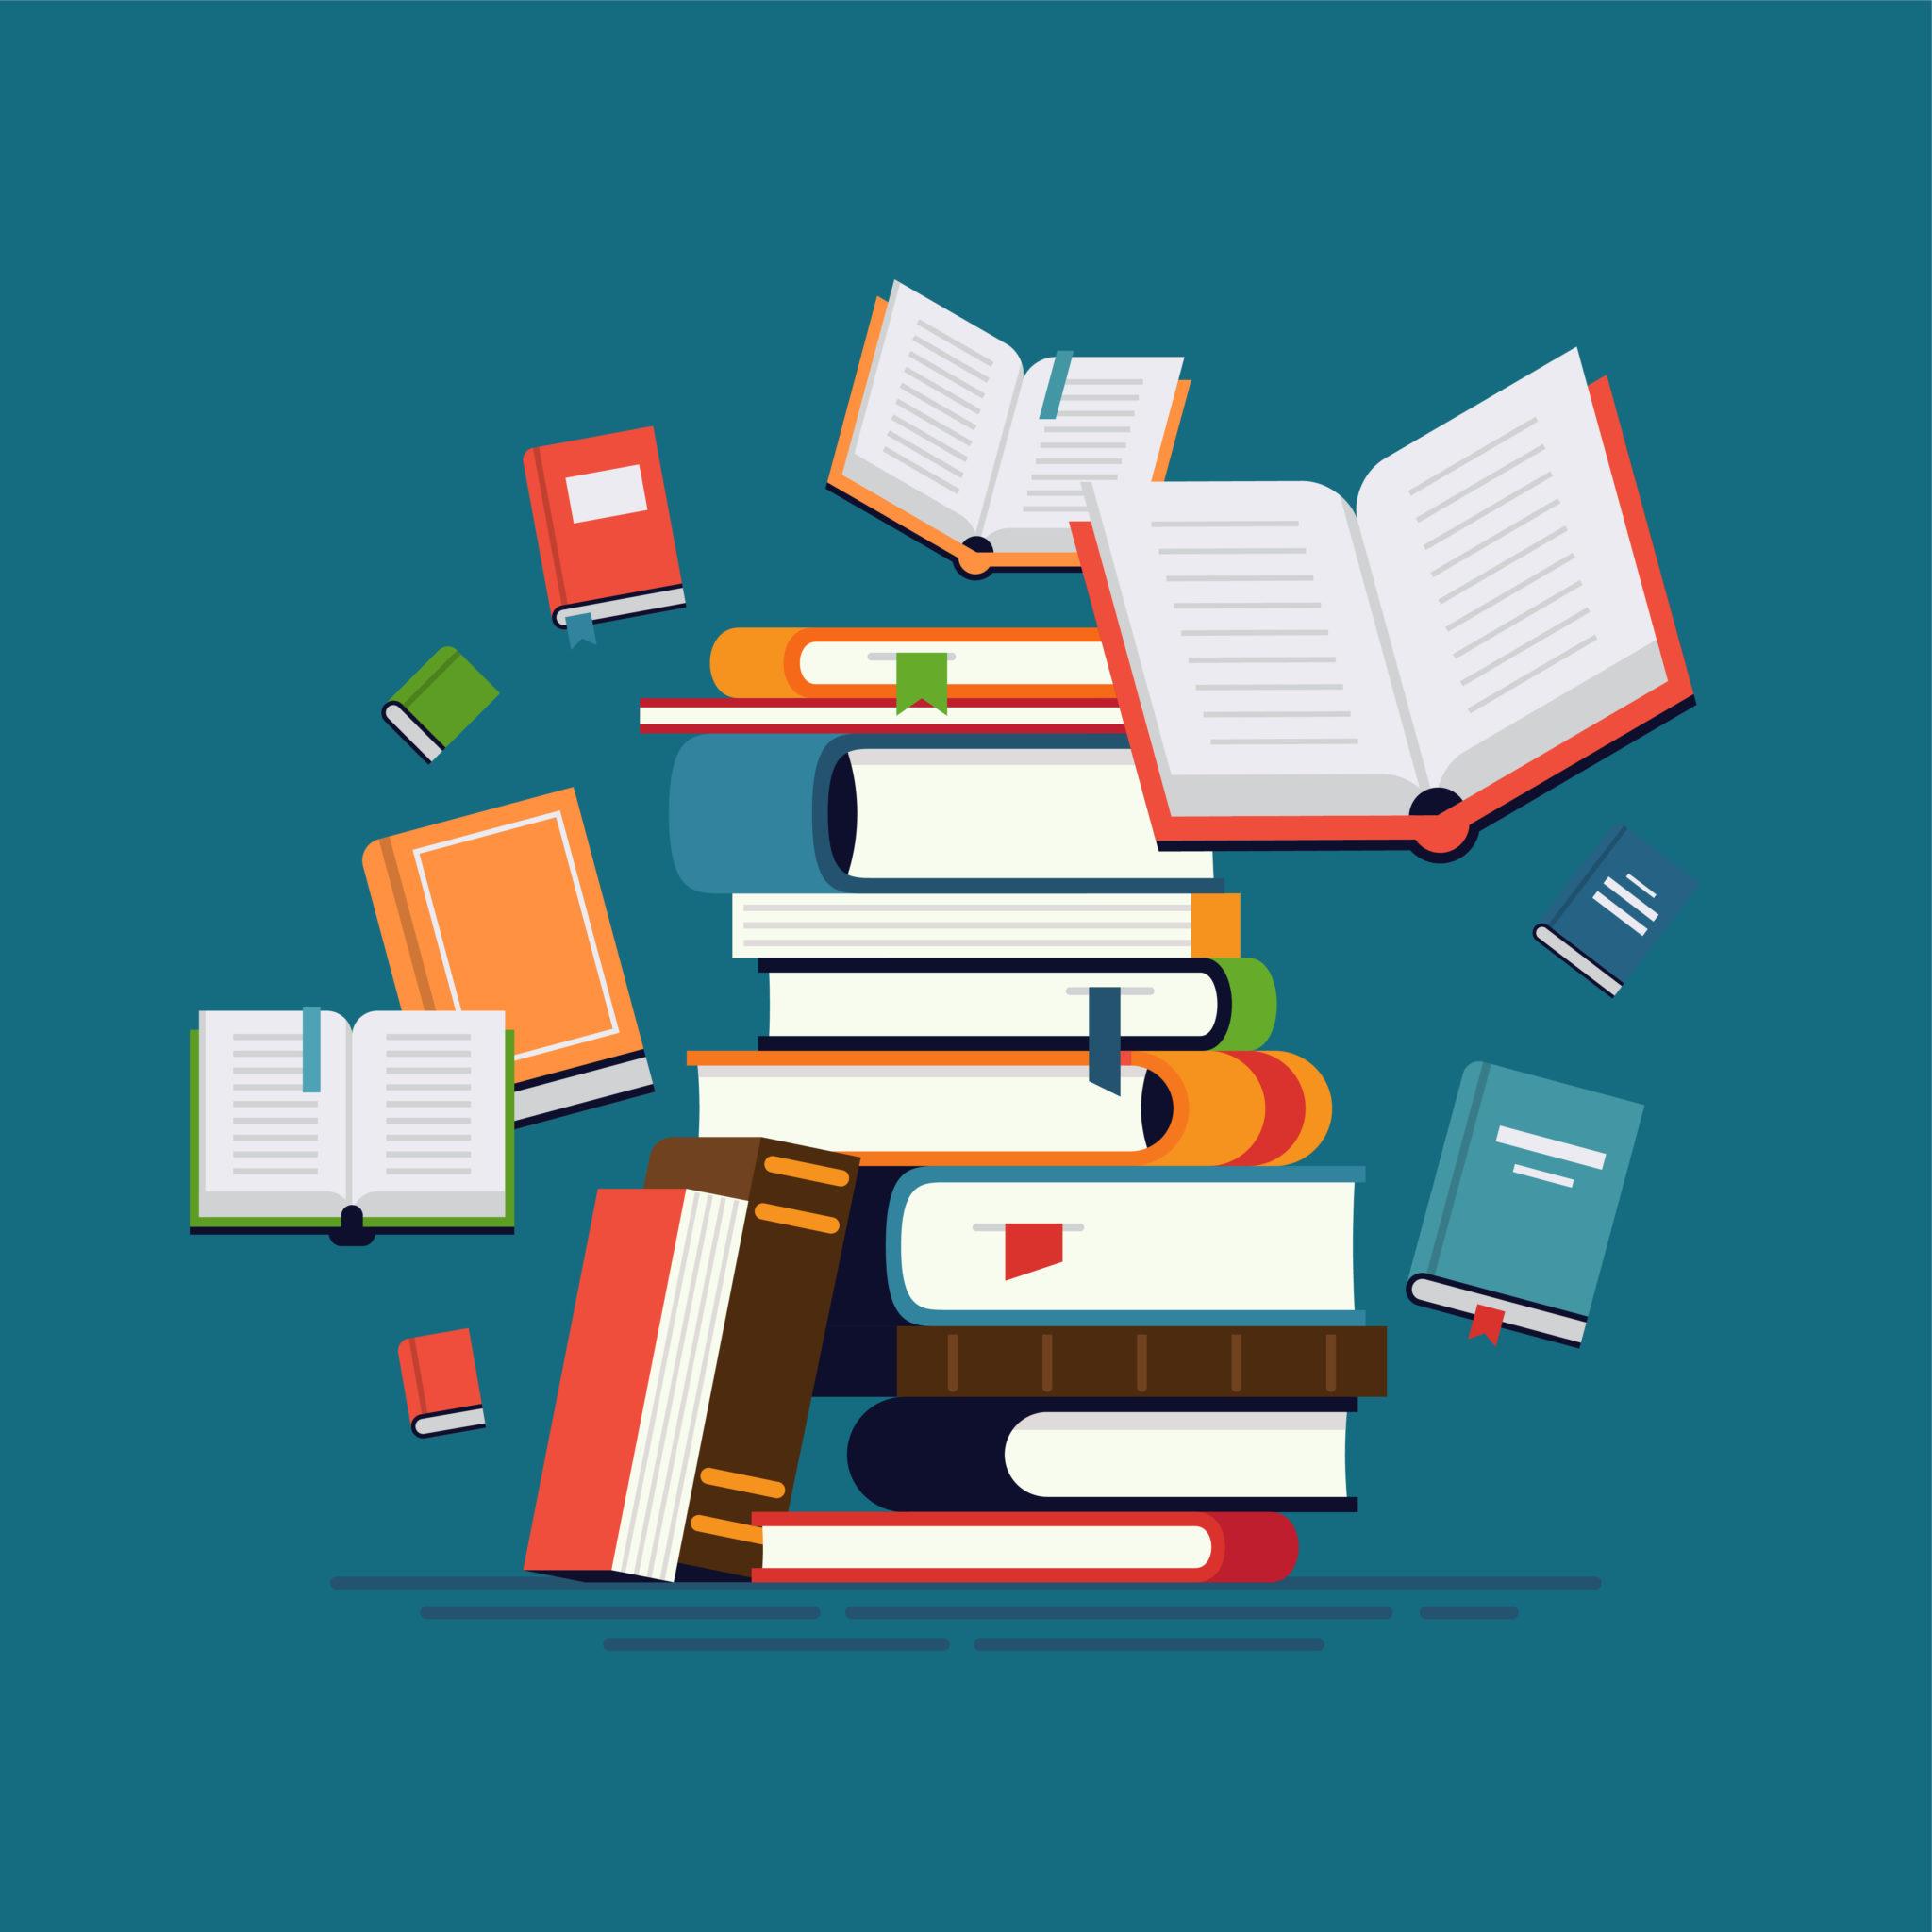 Series Books